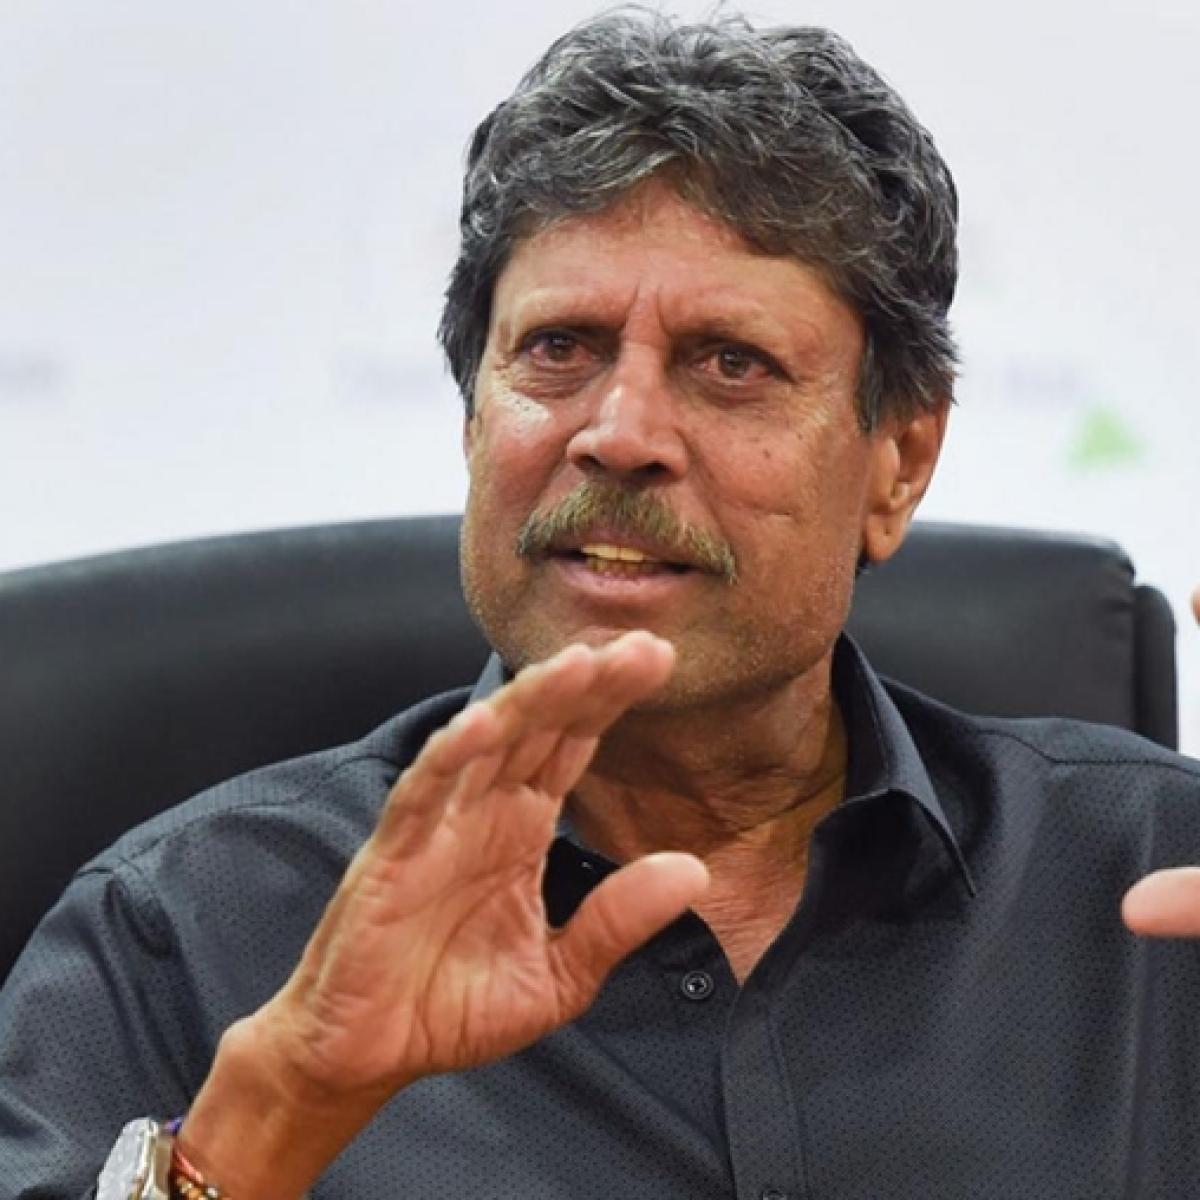 'India doesn't need money': Kapil Dev responds to Shoaib Akhtar's India-Pakistan cricket series proposal amid coronavirus